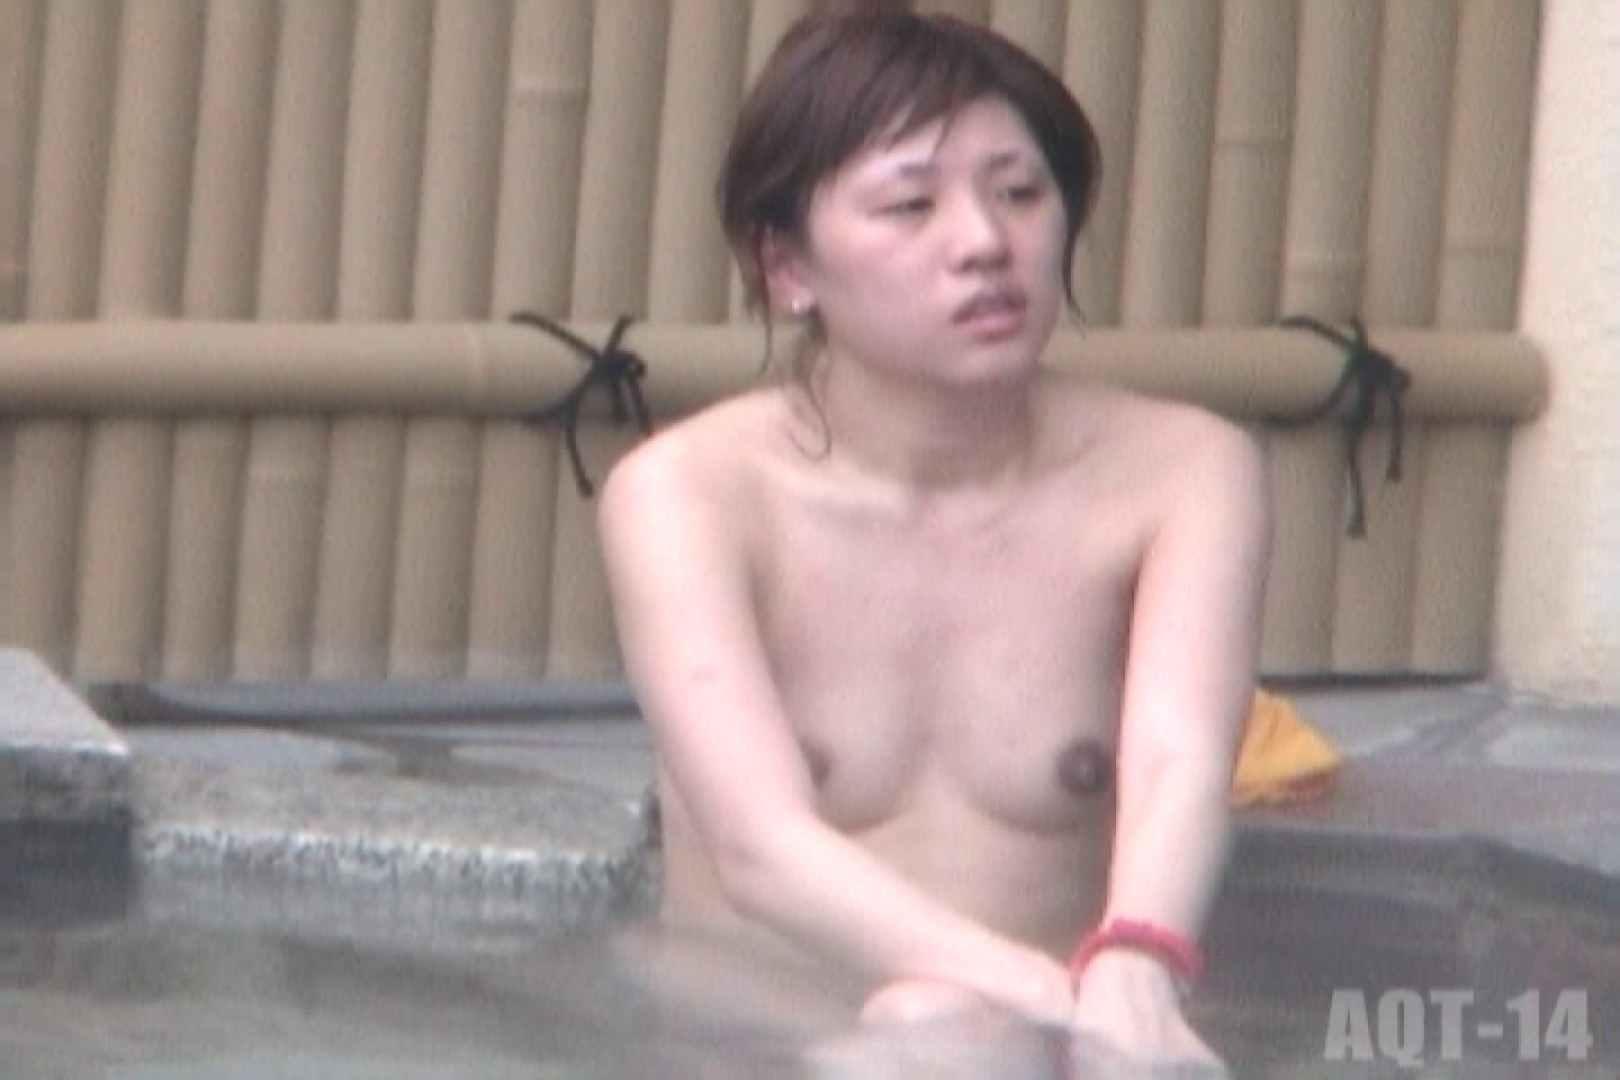 Aquaな露天風呂Vol.822 盗撮大放出 エロ無料画像 98連発 78